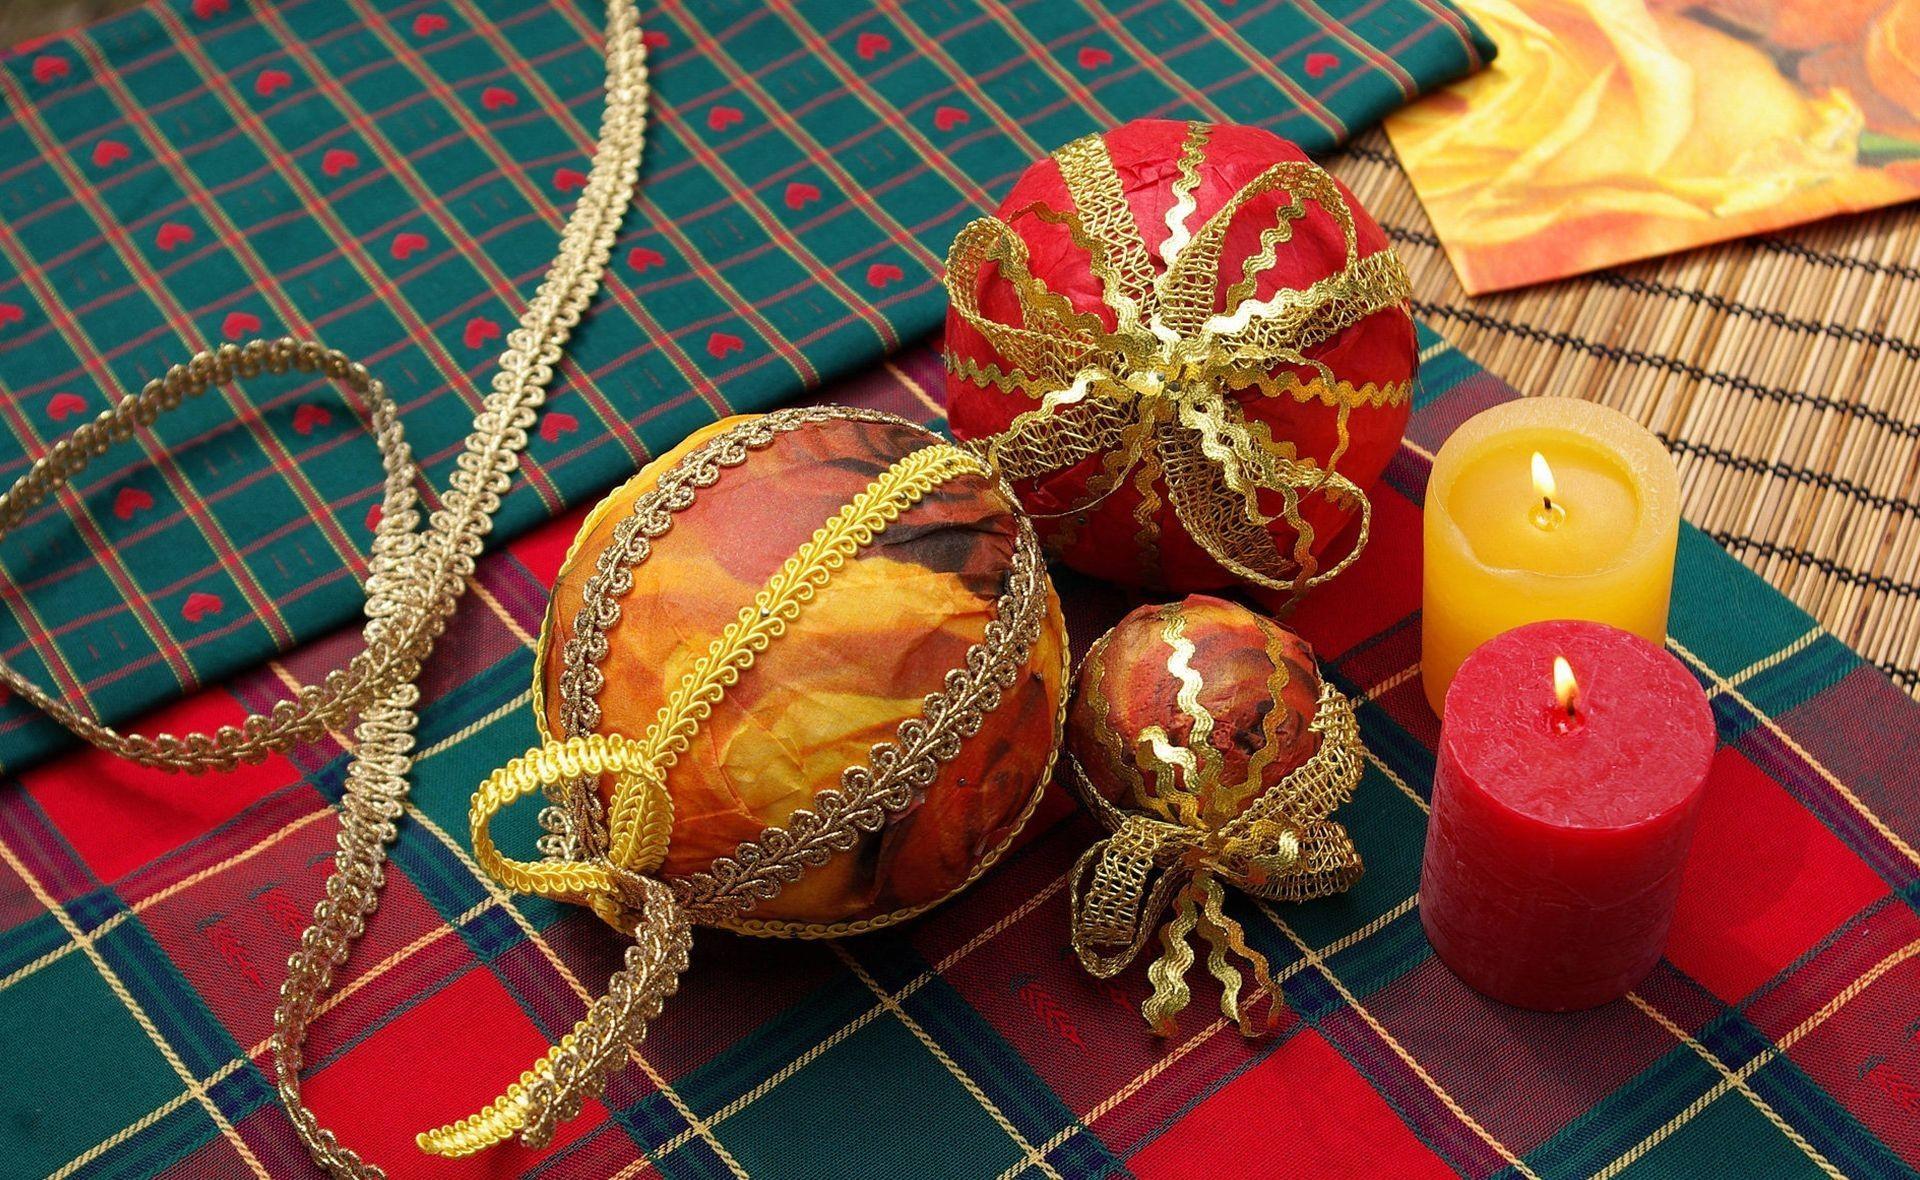 christmas decorations, candles, cloth Wallpaper, HD ...